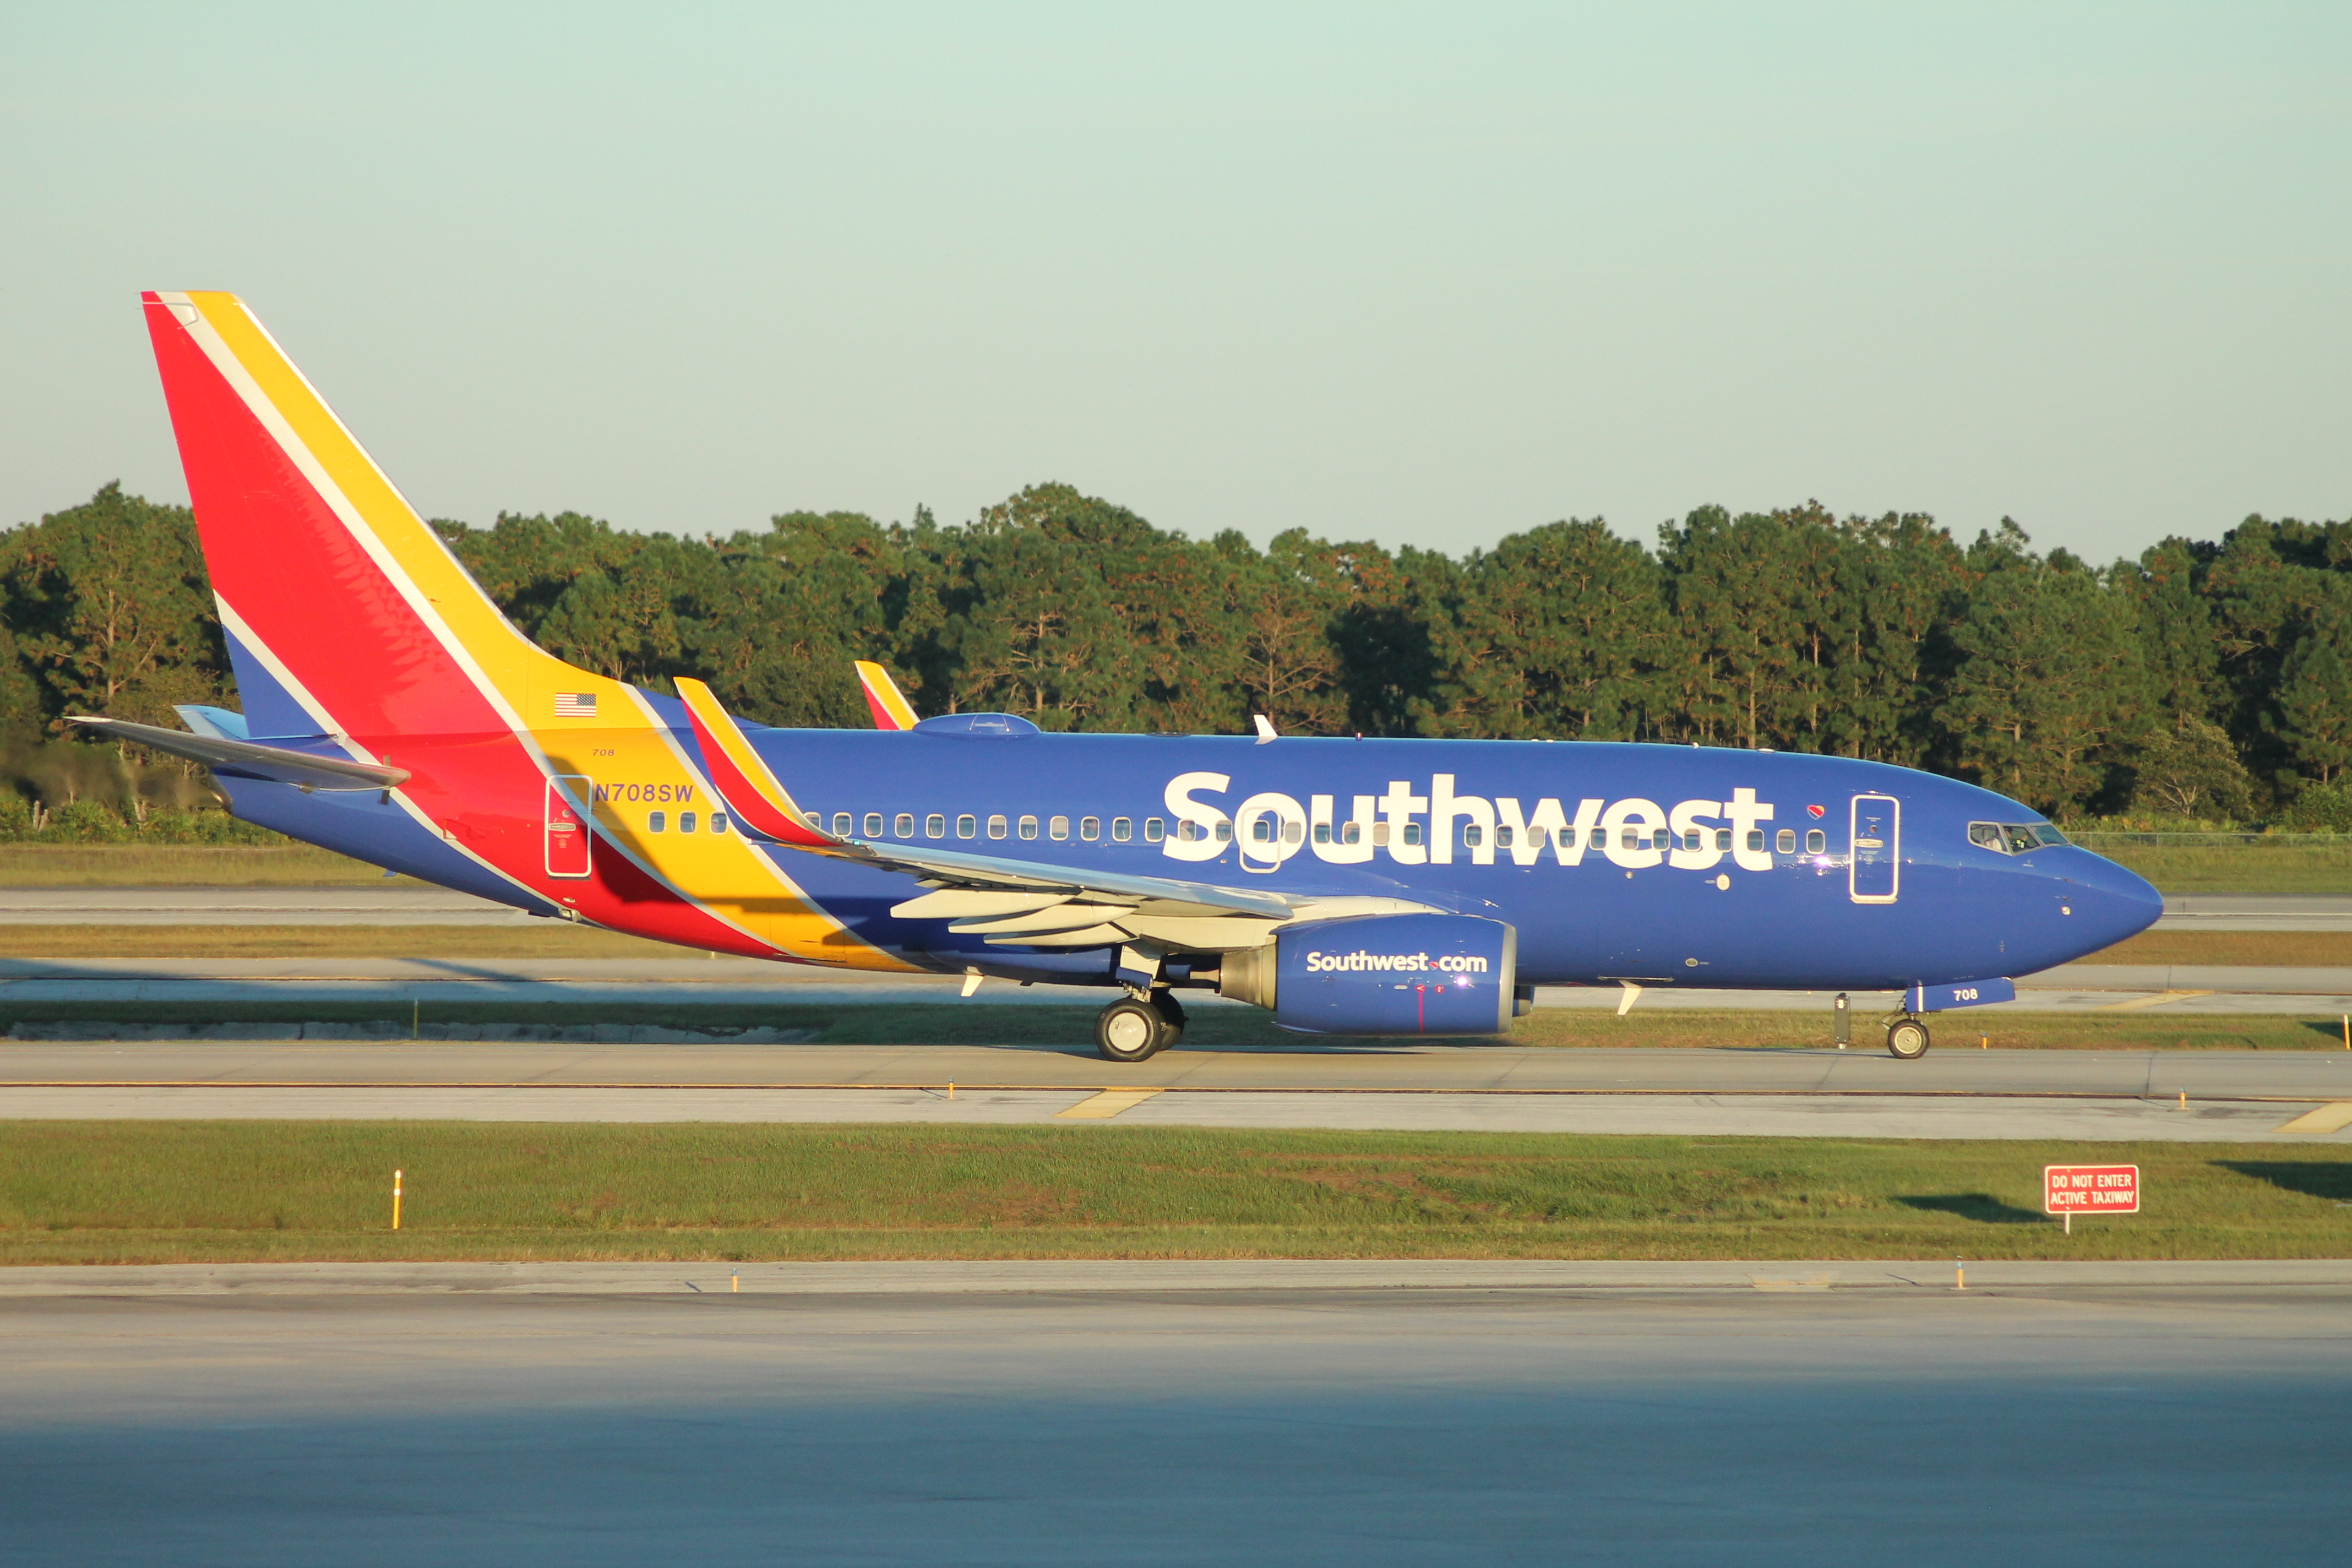 FileSouthwest Airlines Boeing 737700 2014 liveryjpg